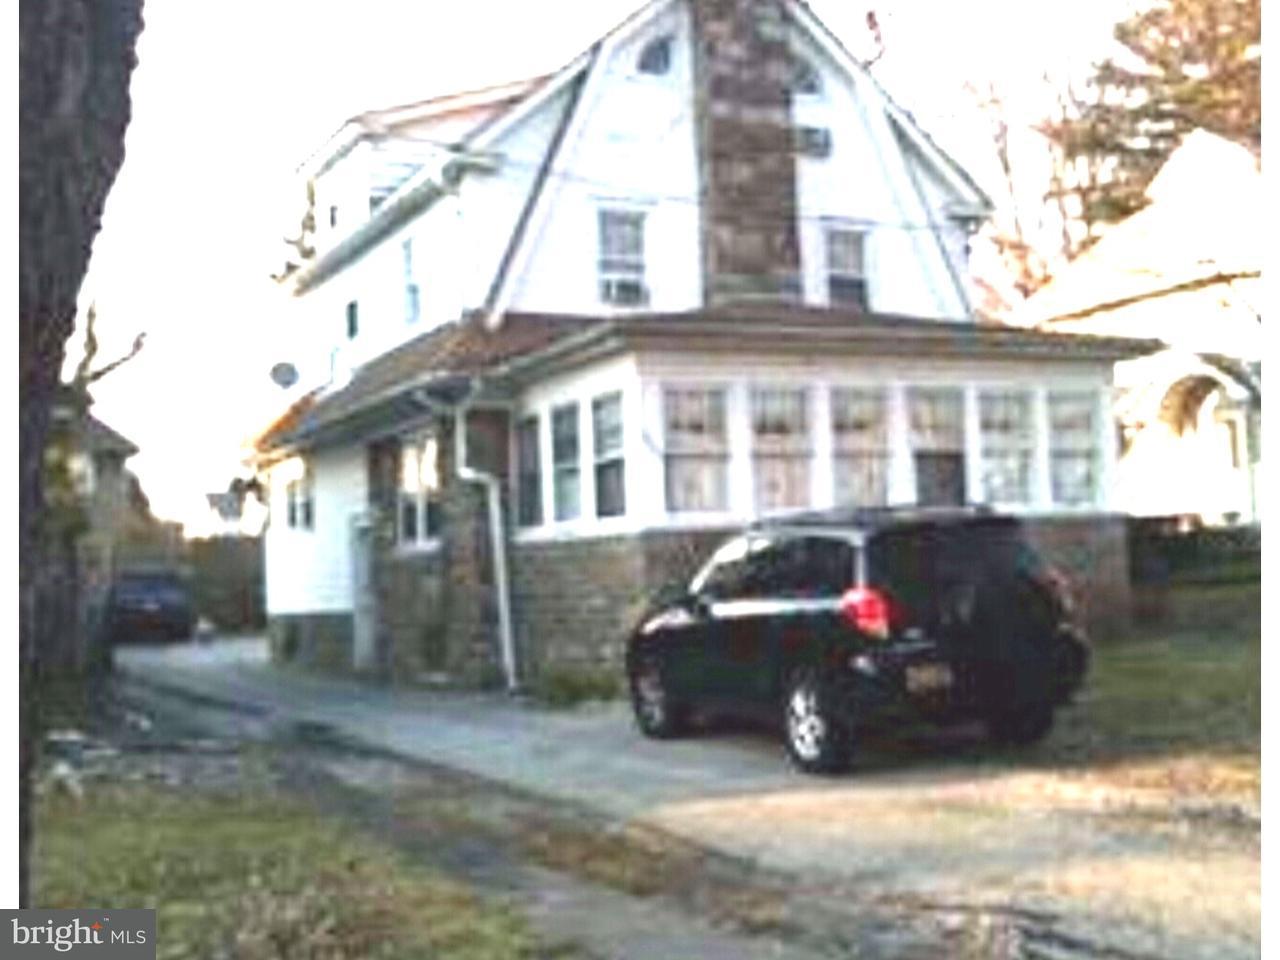 3807  State Drexel Hill, PA 19026